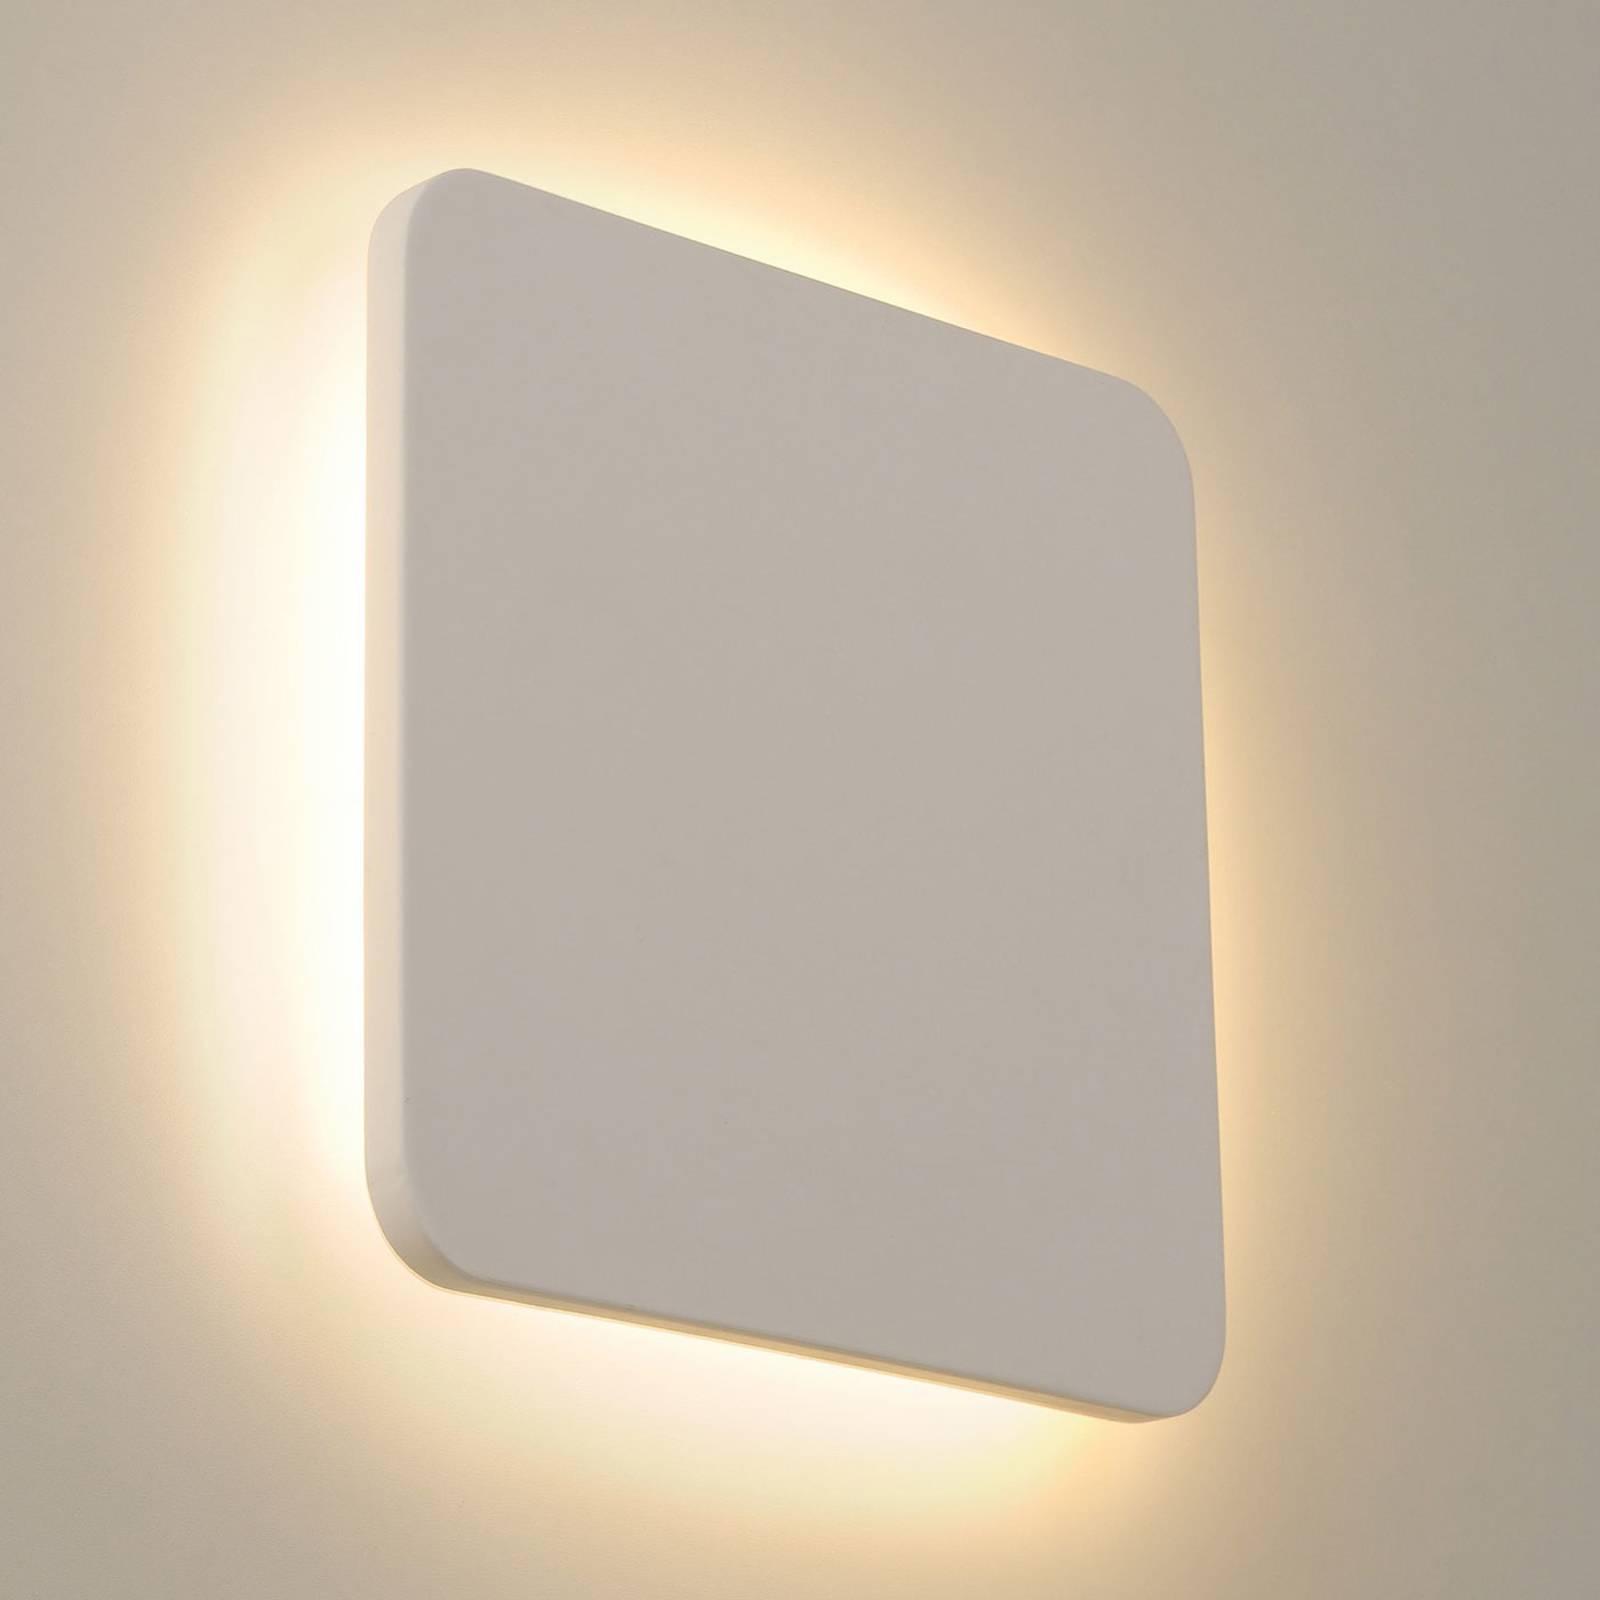 SLV Plastra LED-Wandleuchte aus Gips eckig 30x30cm